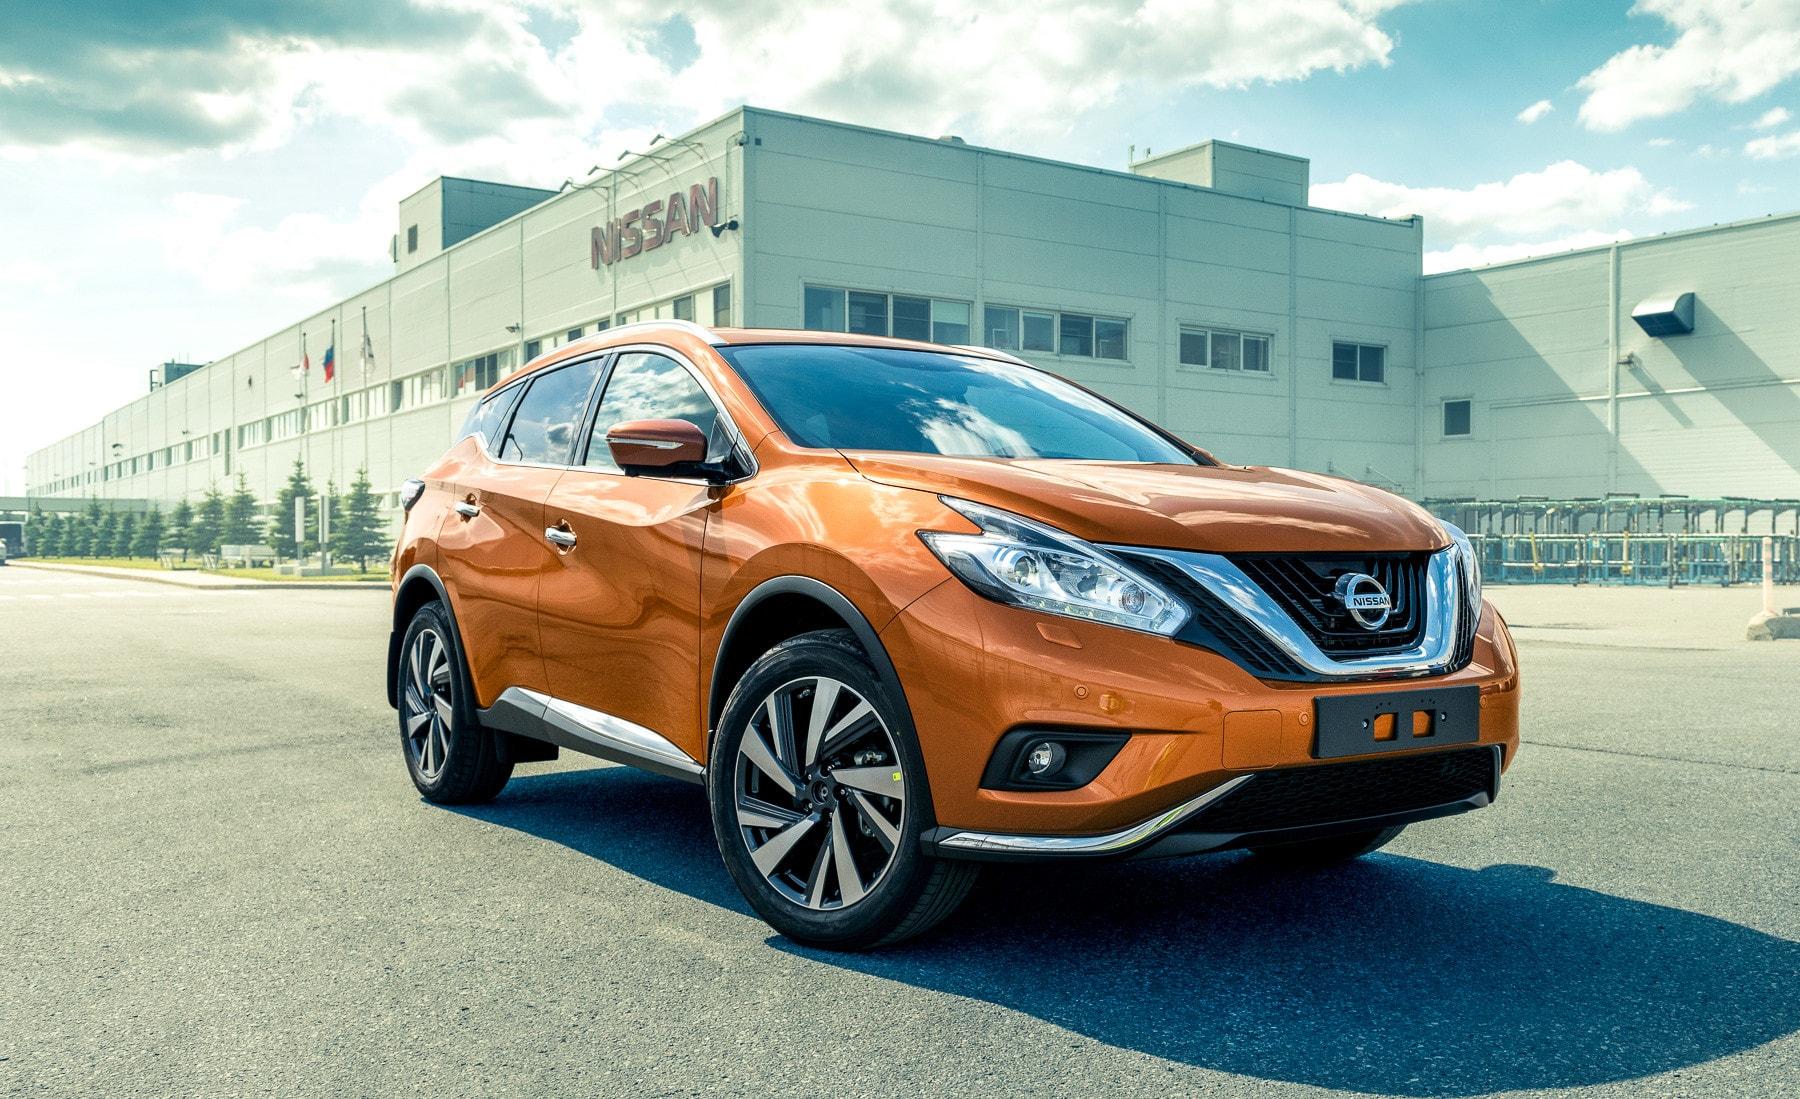 Nissan Murano 3 Full hd wallpapers